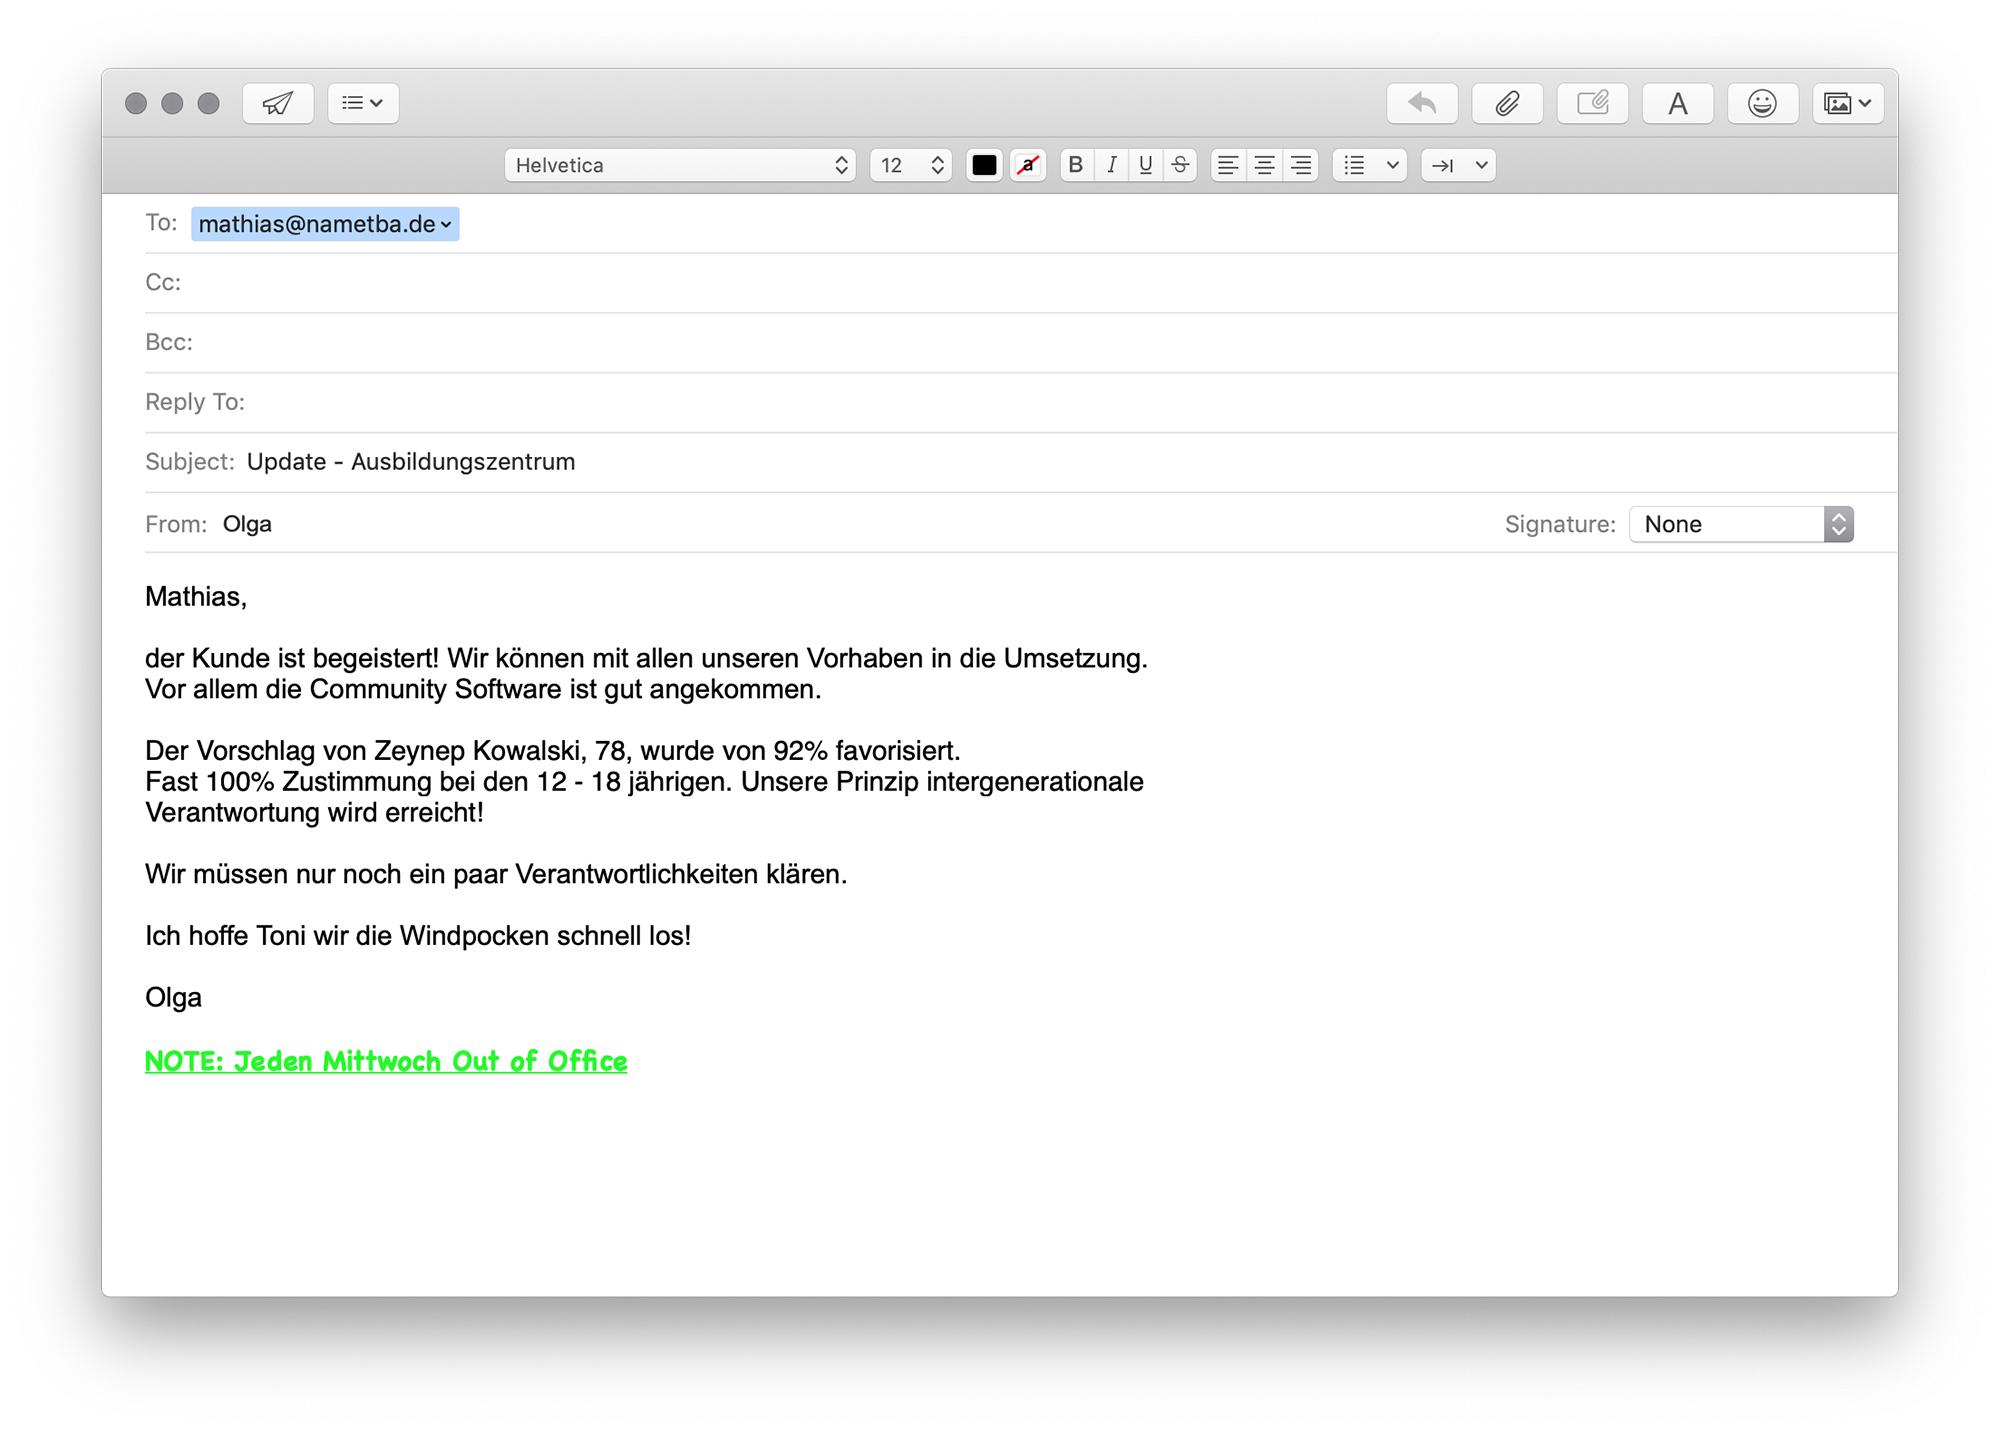 Email, Betreff: Update - Ausbildungszentrum, von olga@nametba.de and mathias@nametba.de